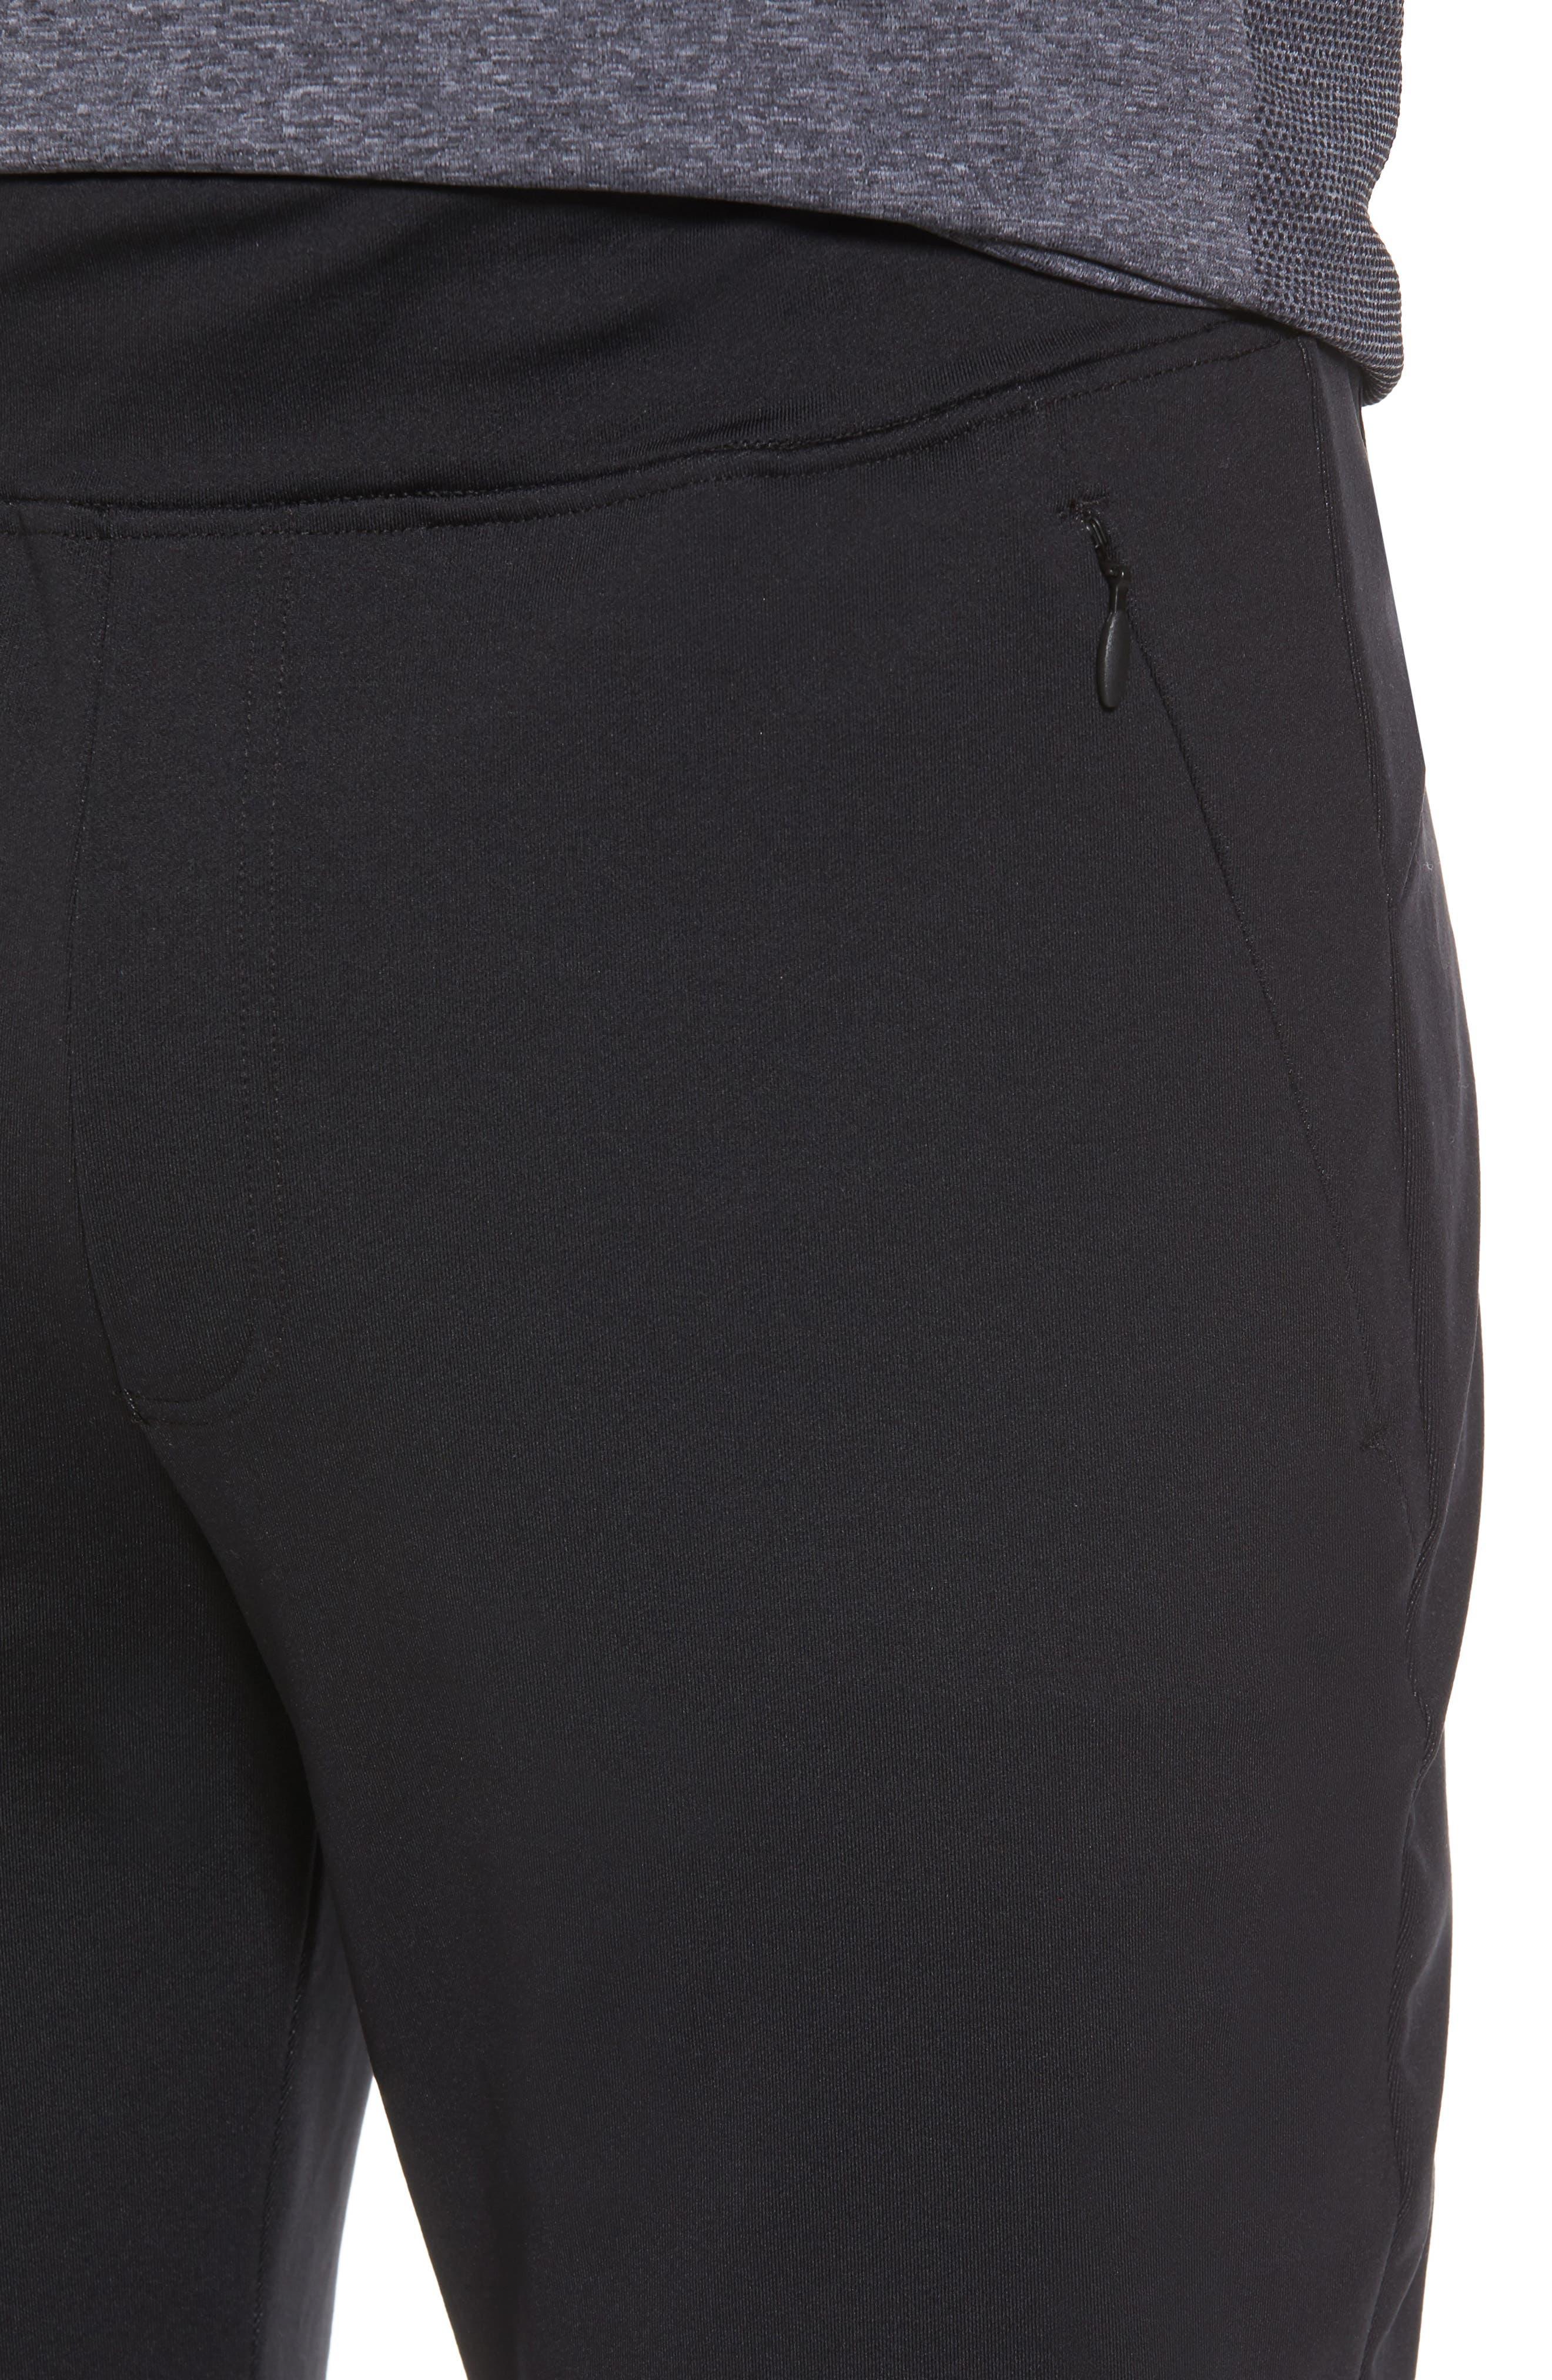 Everywear Jogger Pants,                             Alternate thumbnail 4, color,                             Black